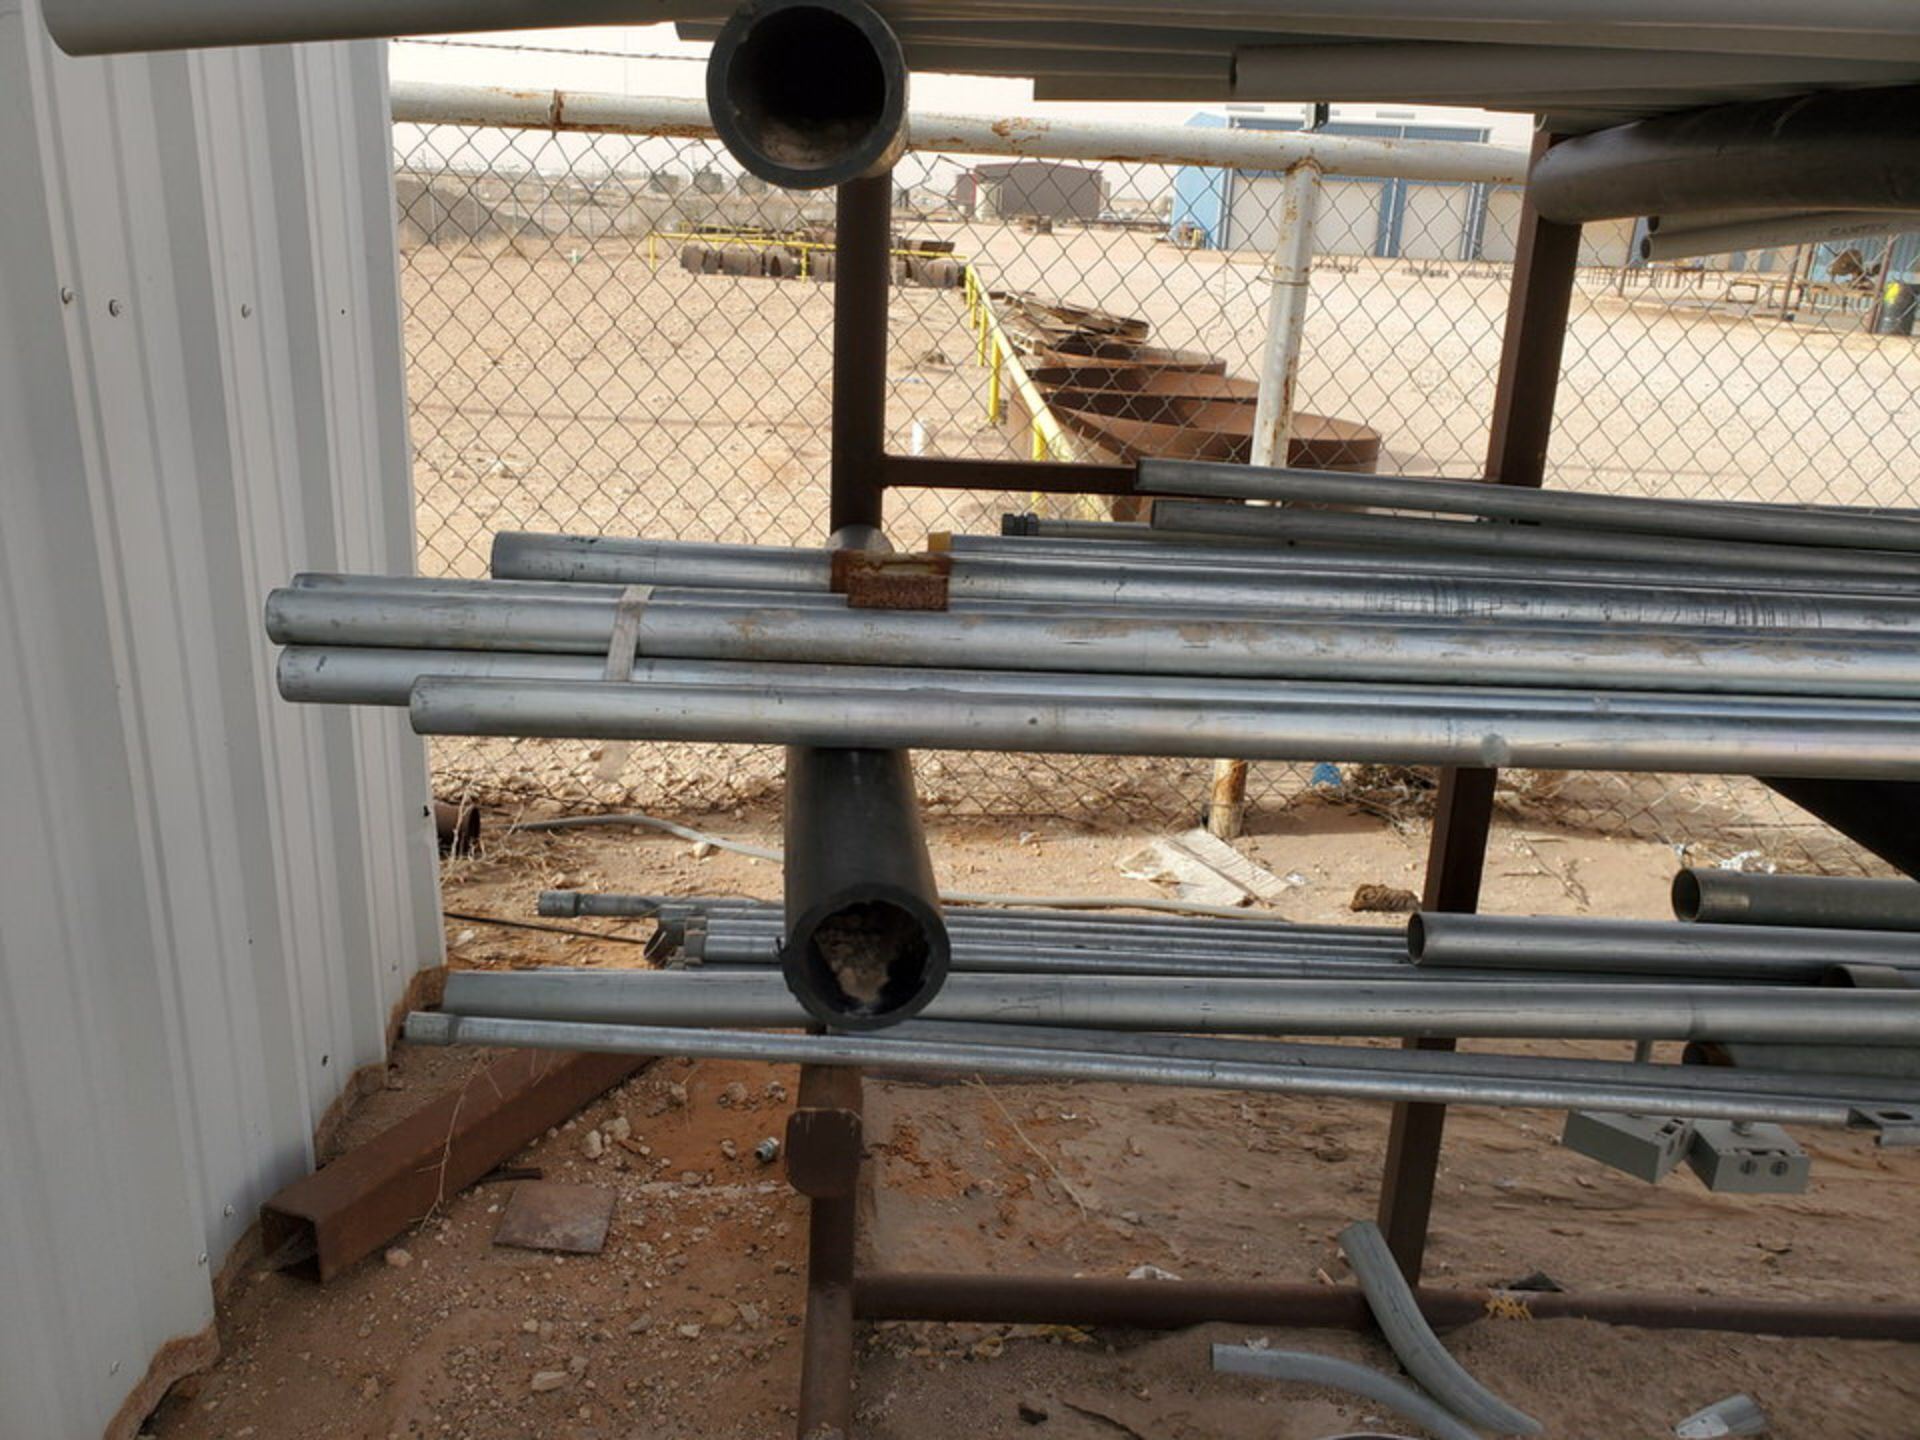 "PVC & Alum. Pipe W/ Conduit Size Range: 1/2"" - 4"" W/ Rack - Image 15 of 18"